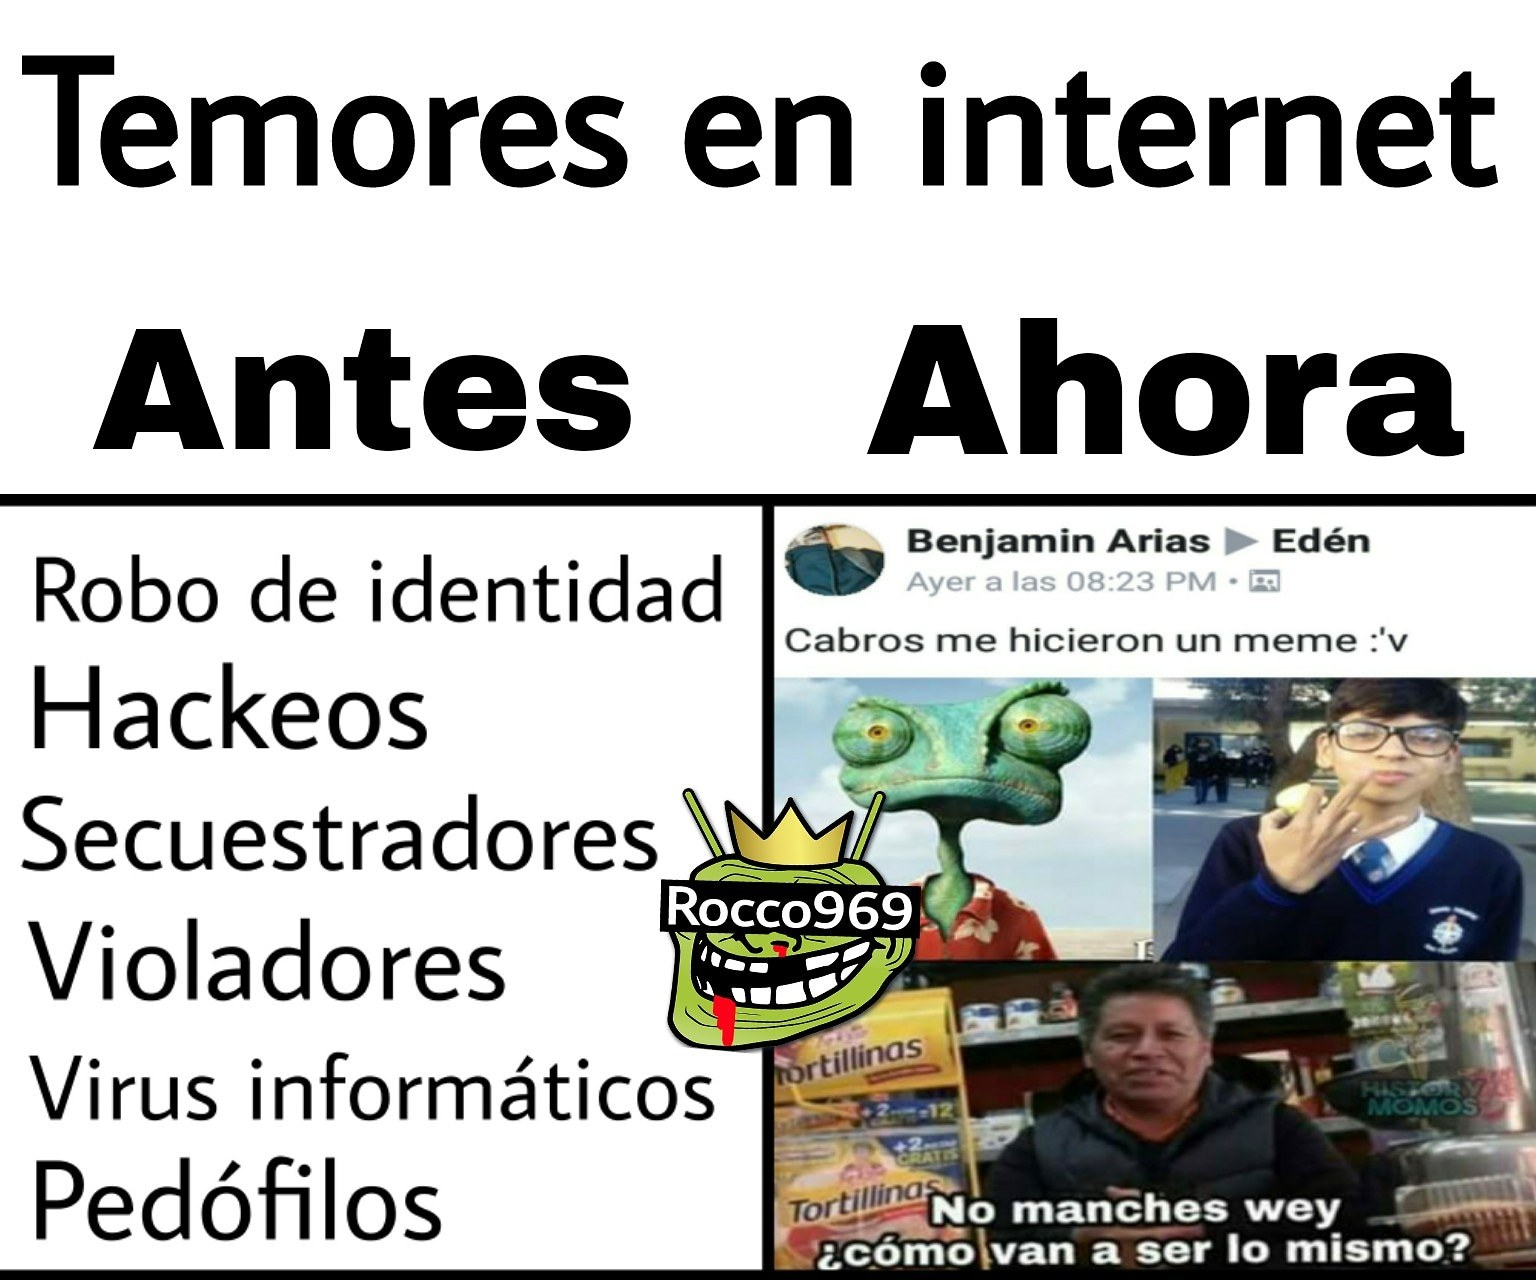 2009 - meme